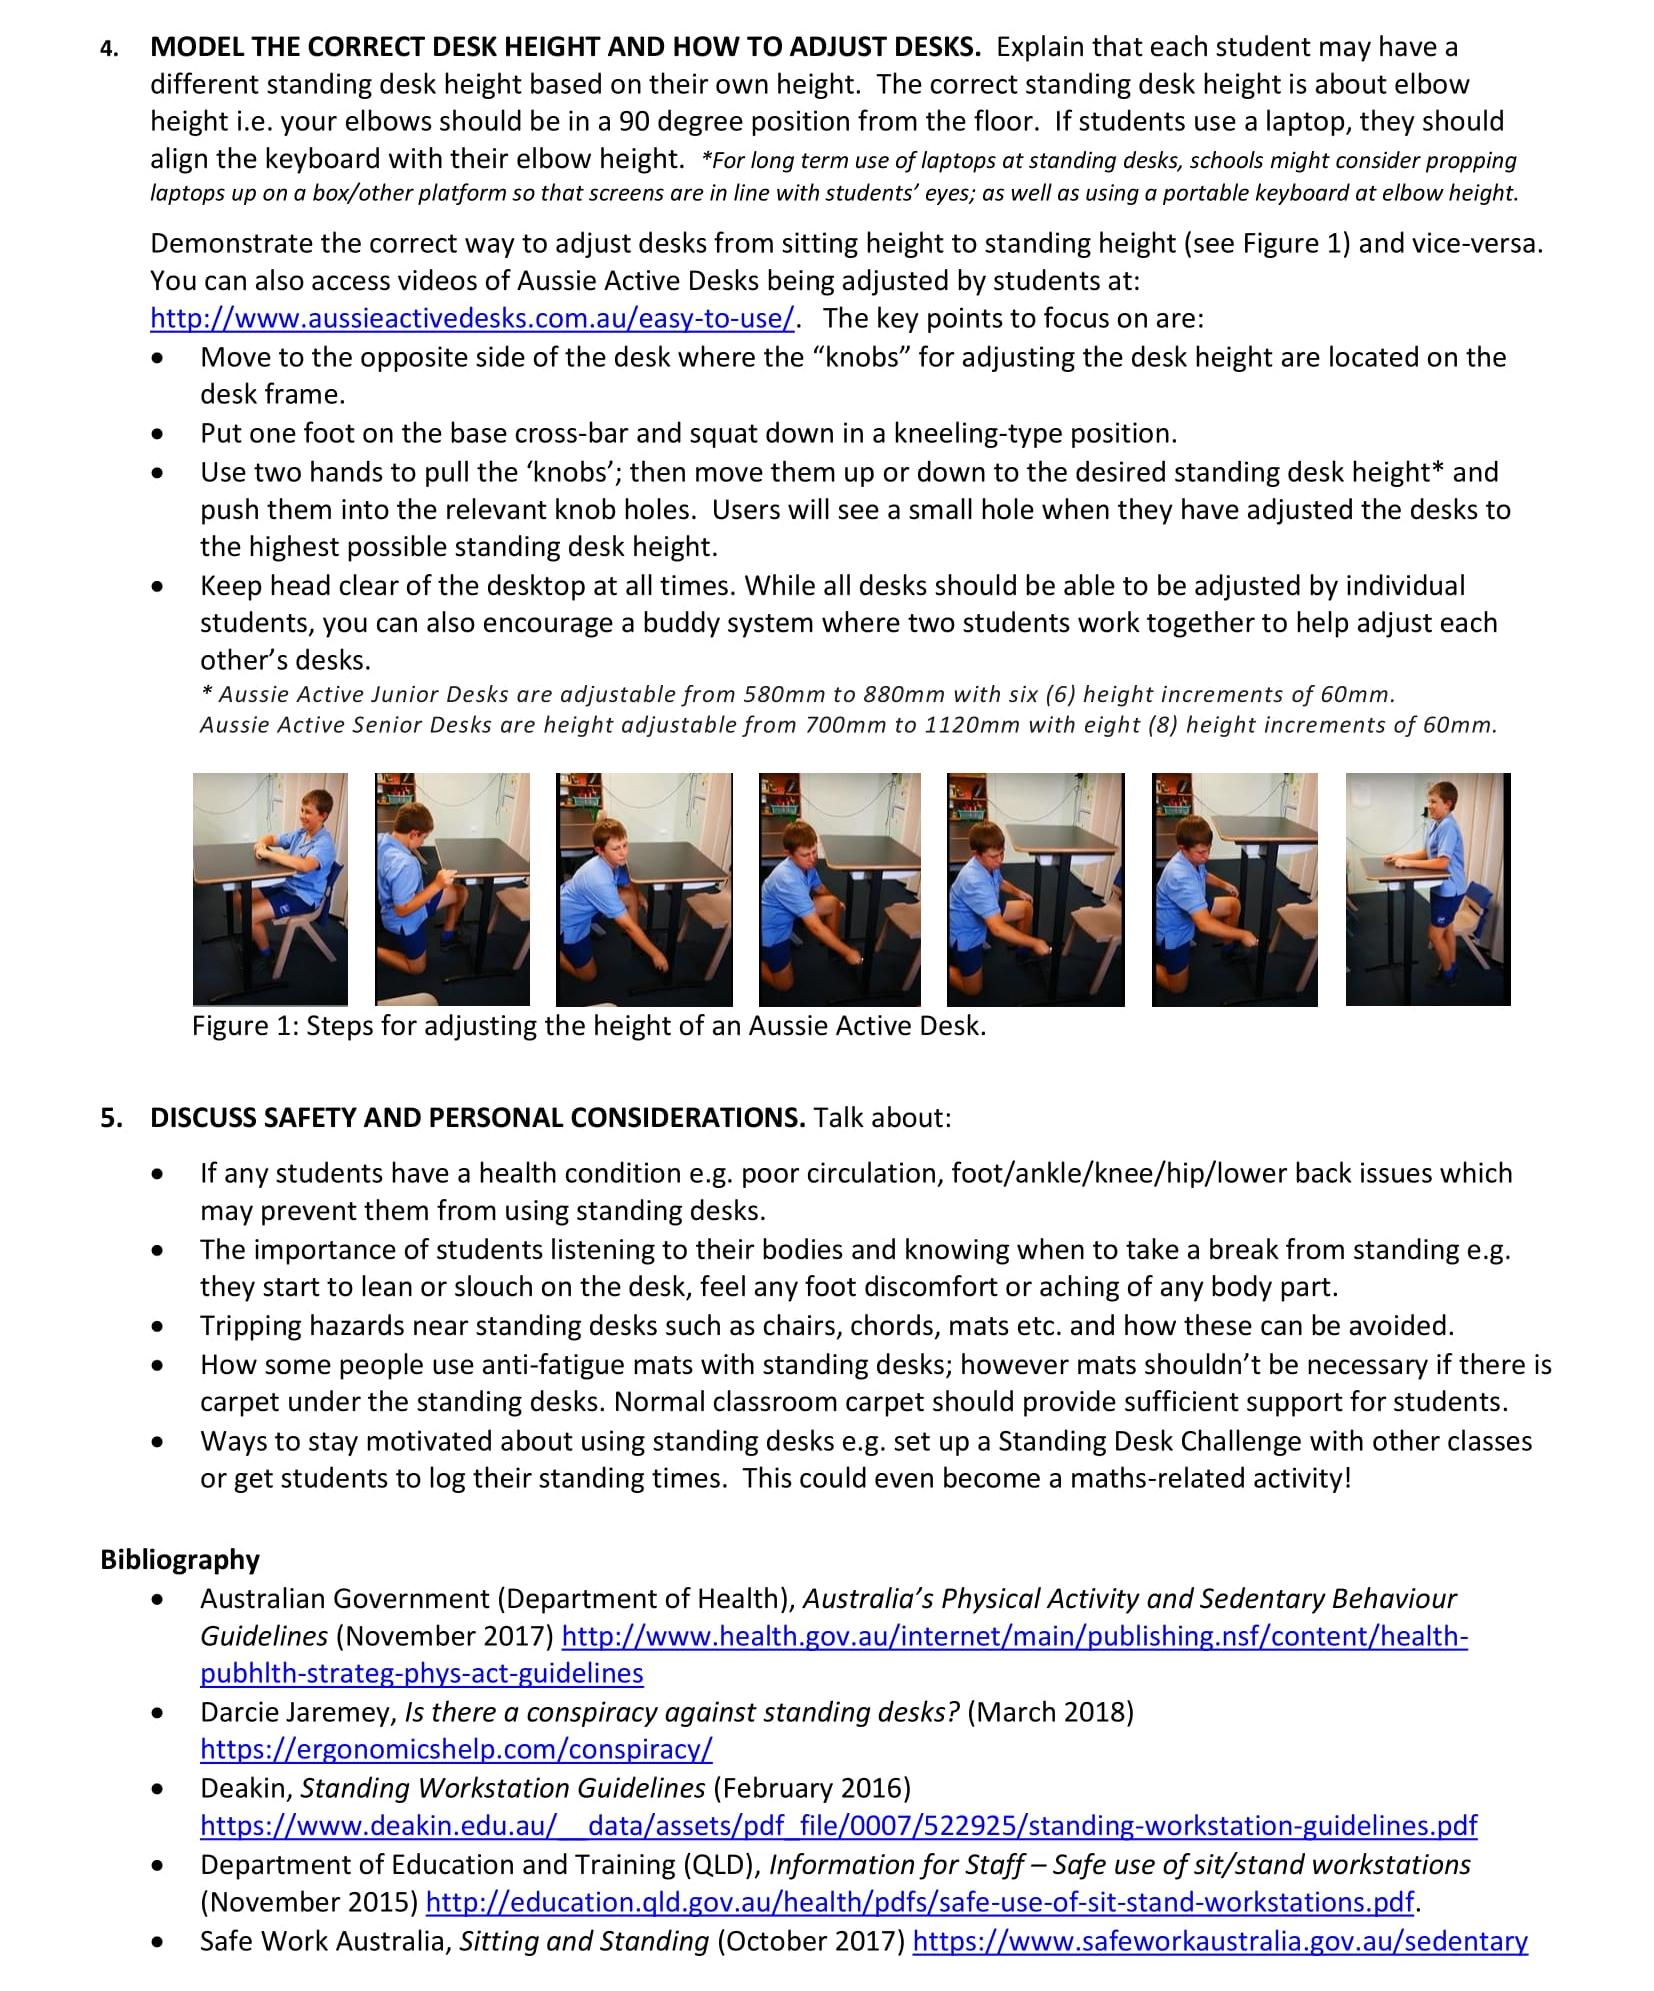 Good Practice Guidelines for using Aussie Active Desks in Classrooms-2.jpg